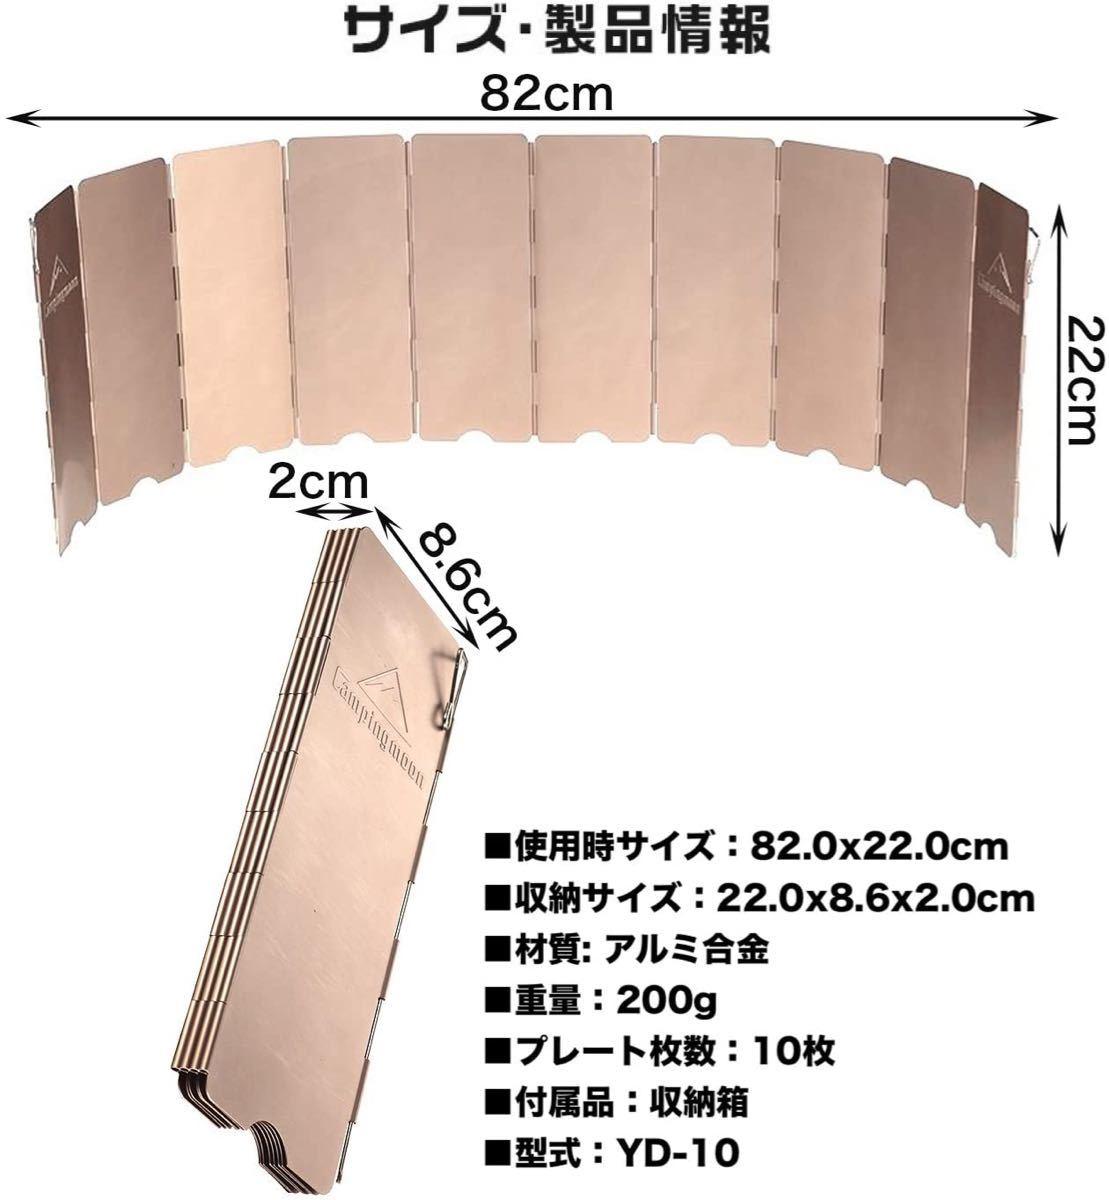 ★CAMPING MOON★キャンピングムーン★ウィンドスクリーンL★折り畳み式 風防板★酸化アルミ被膜プレート★YS-10★